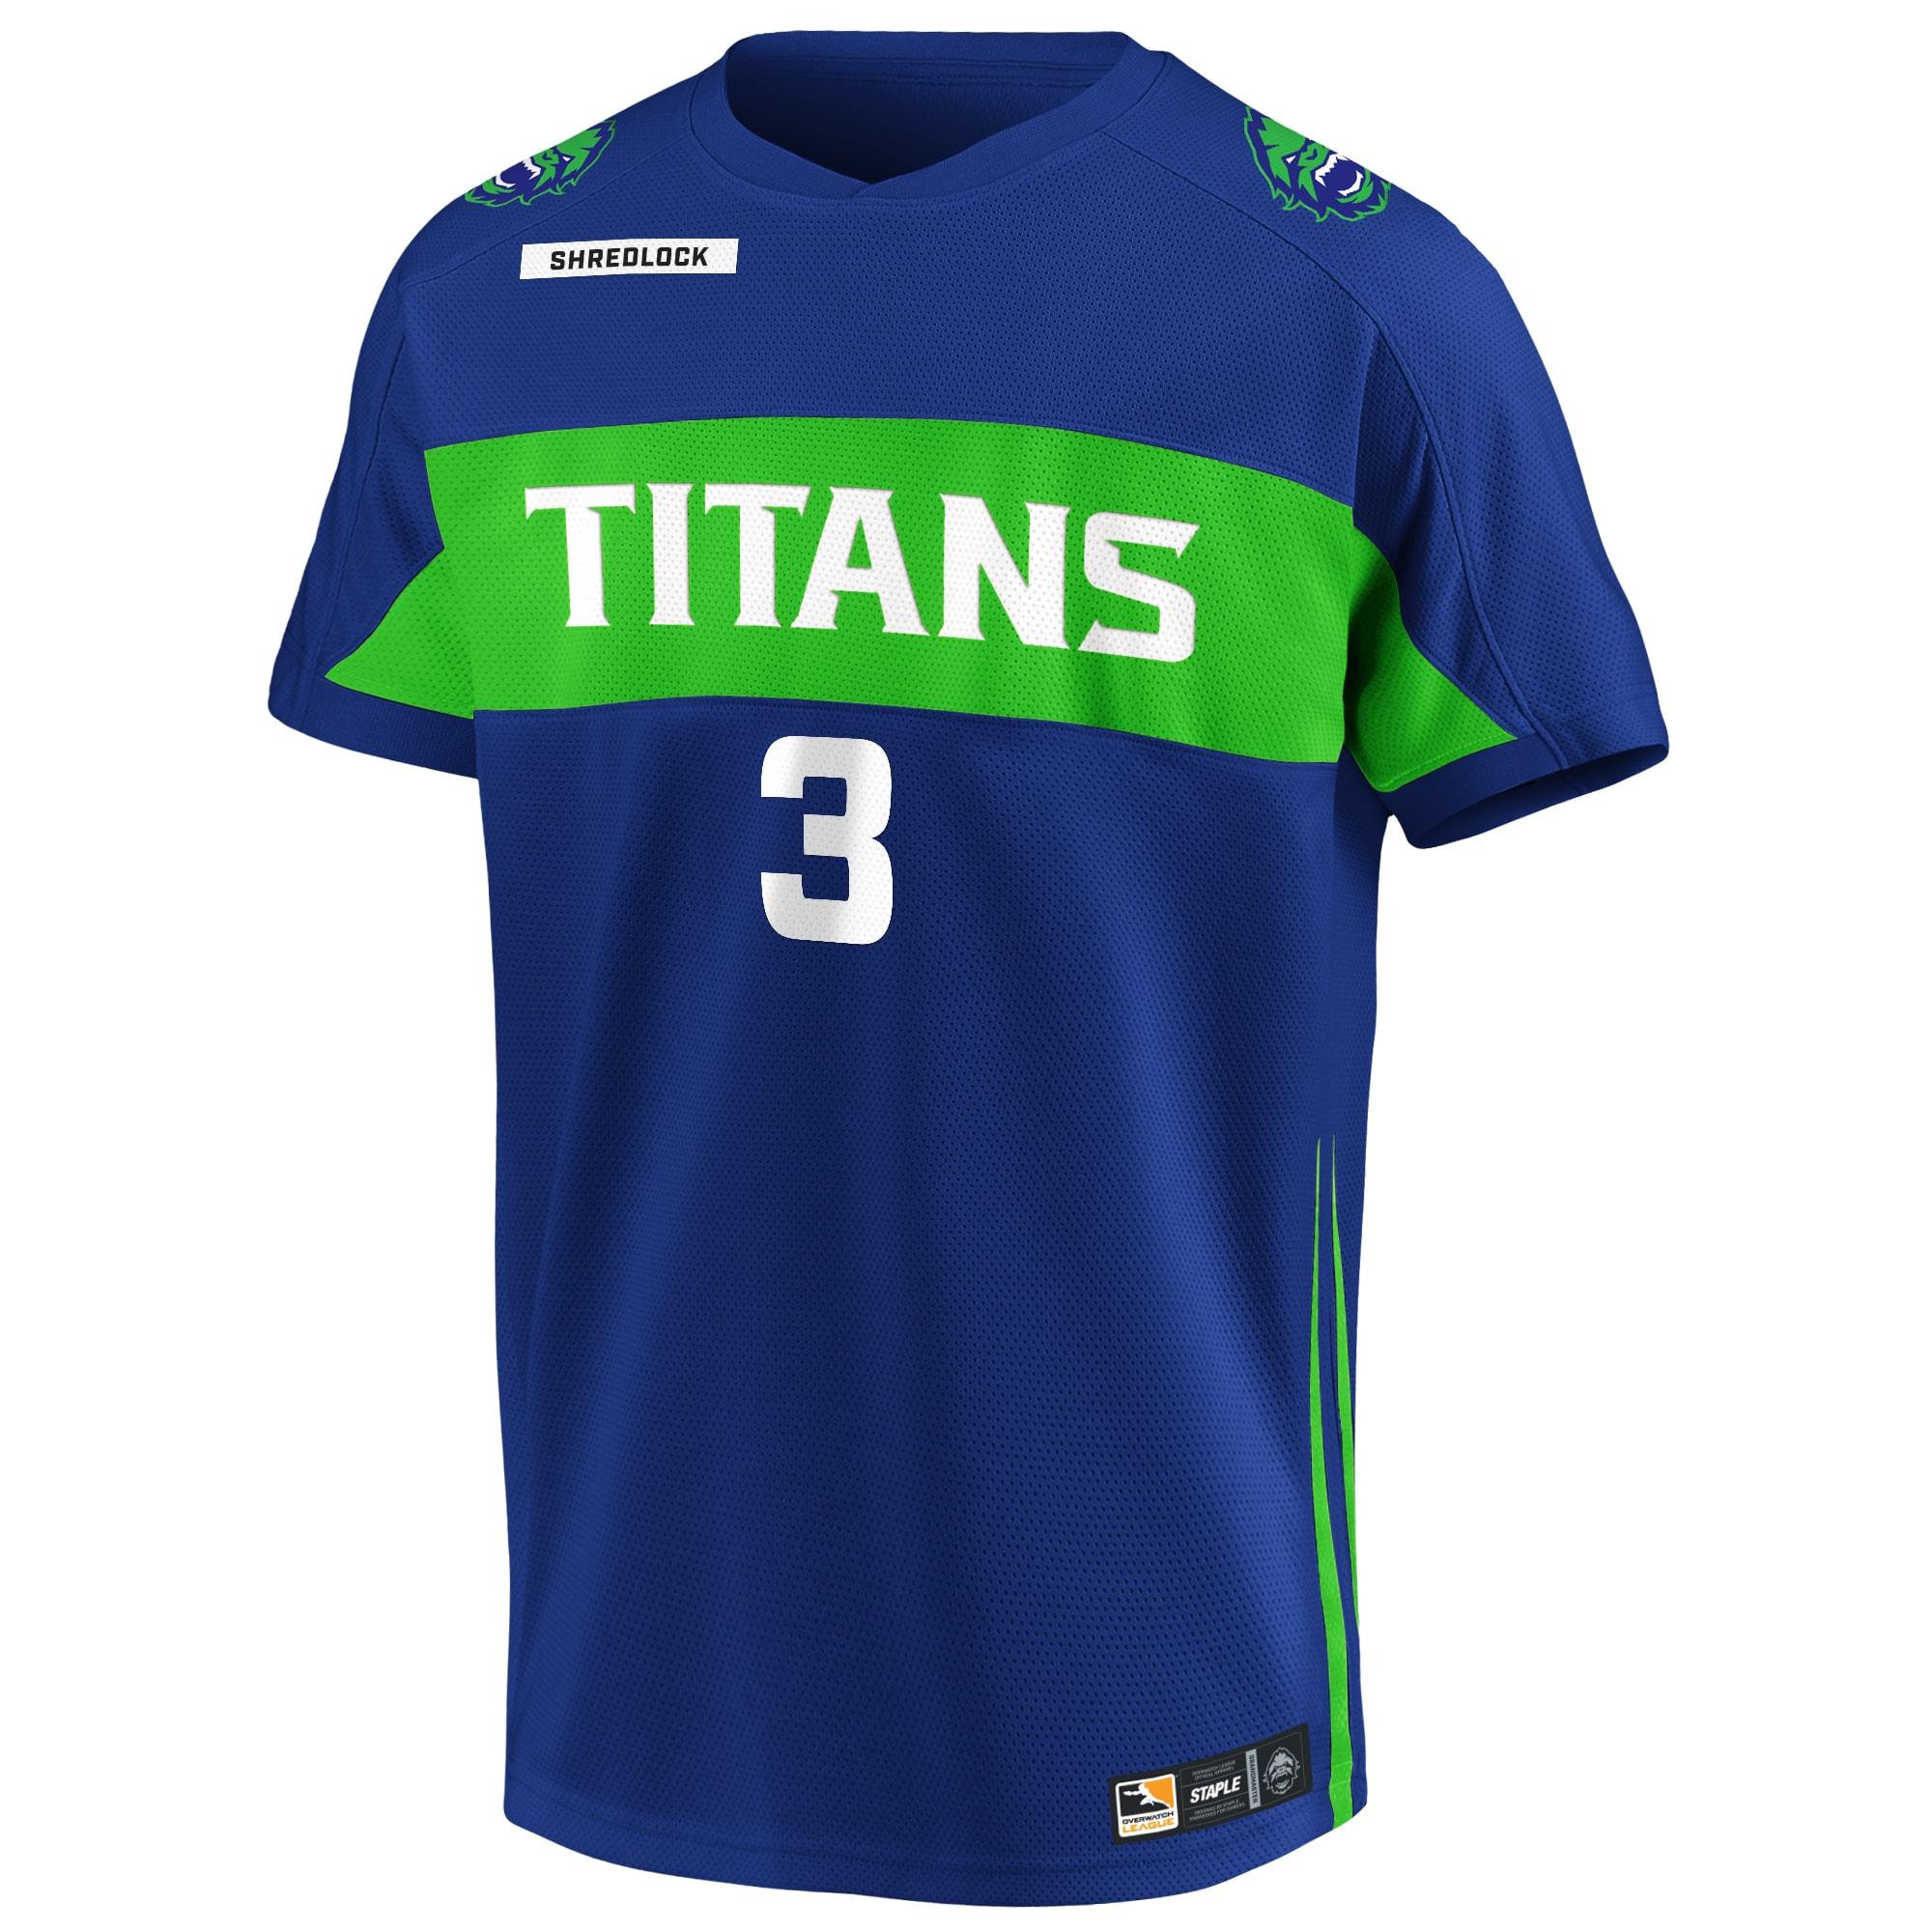 titans black jersey